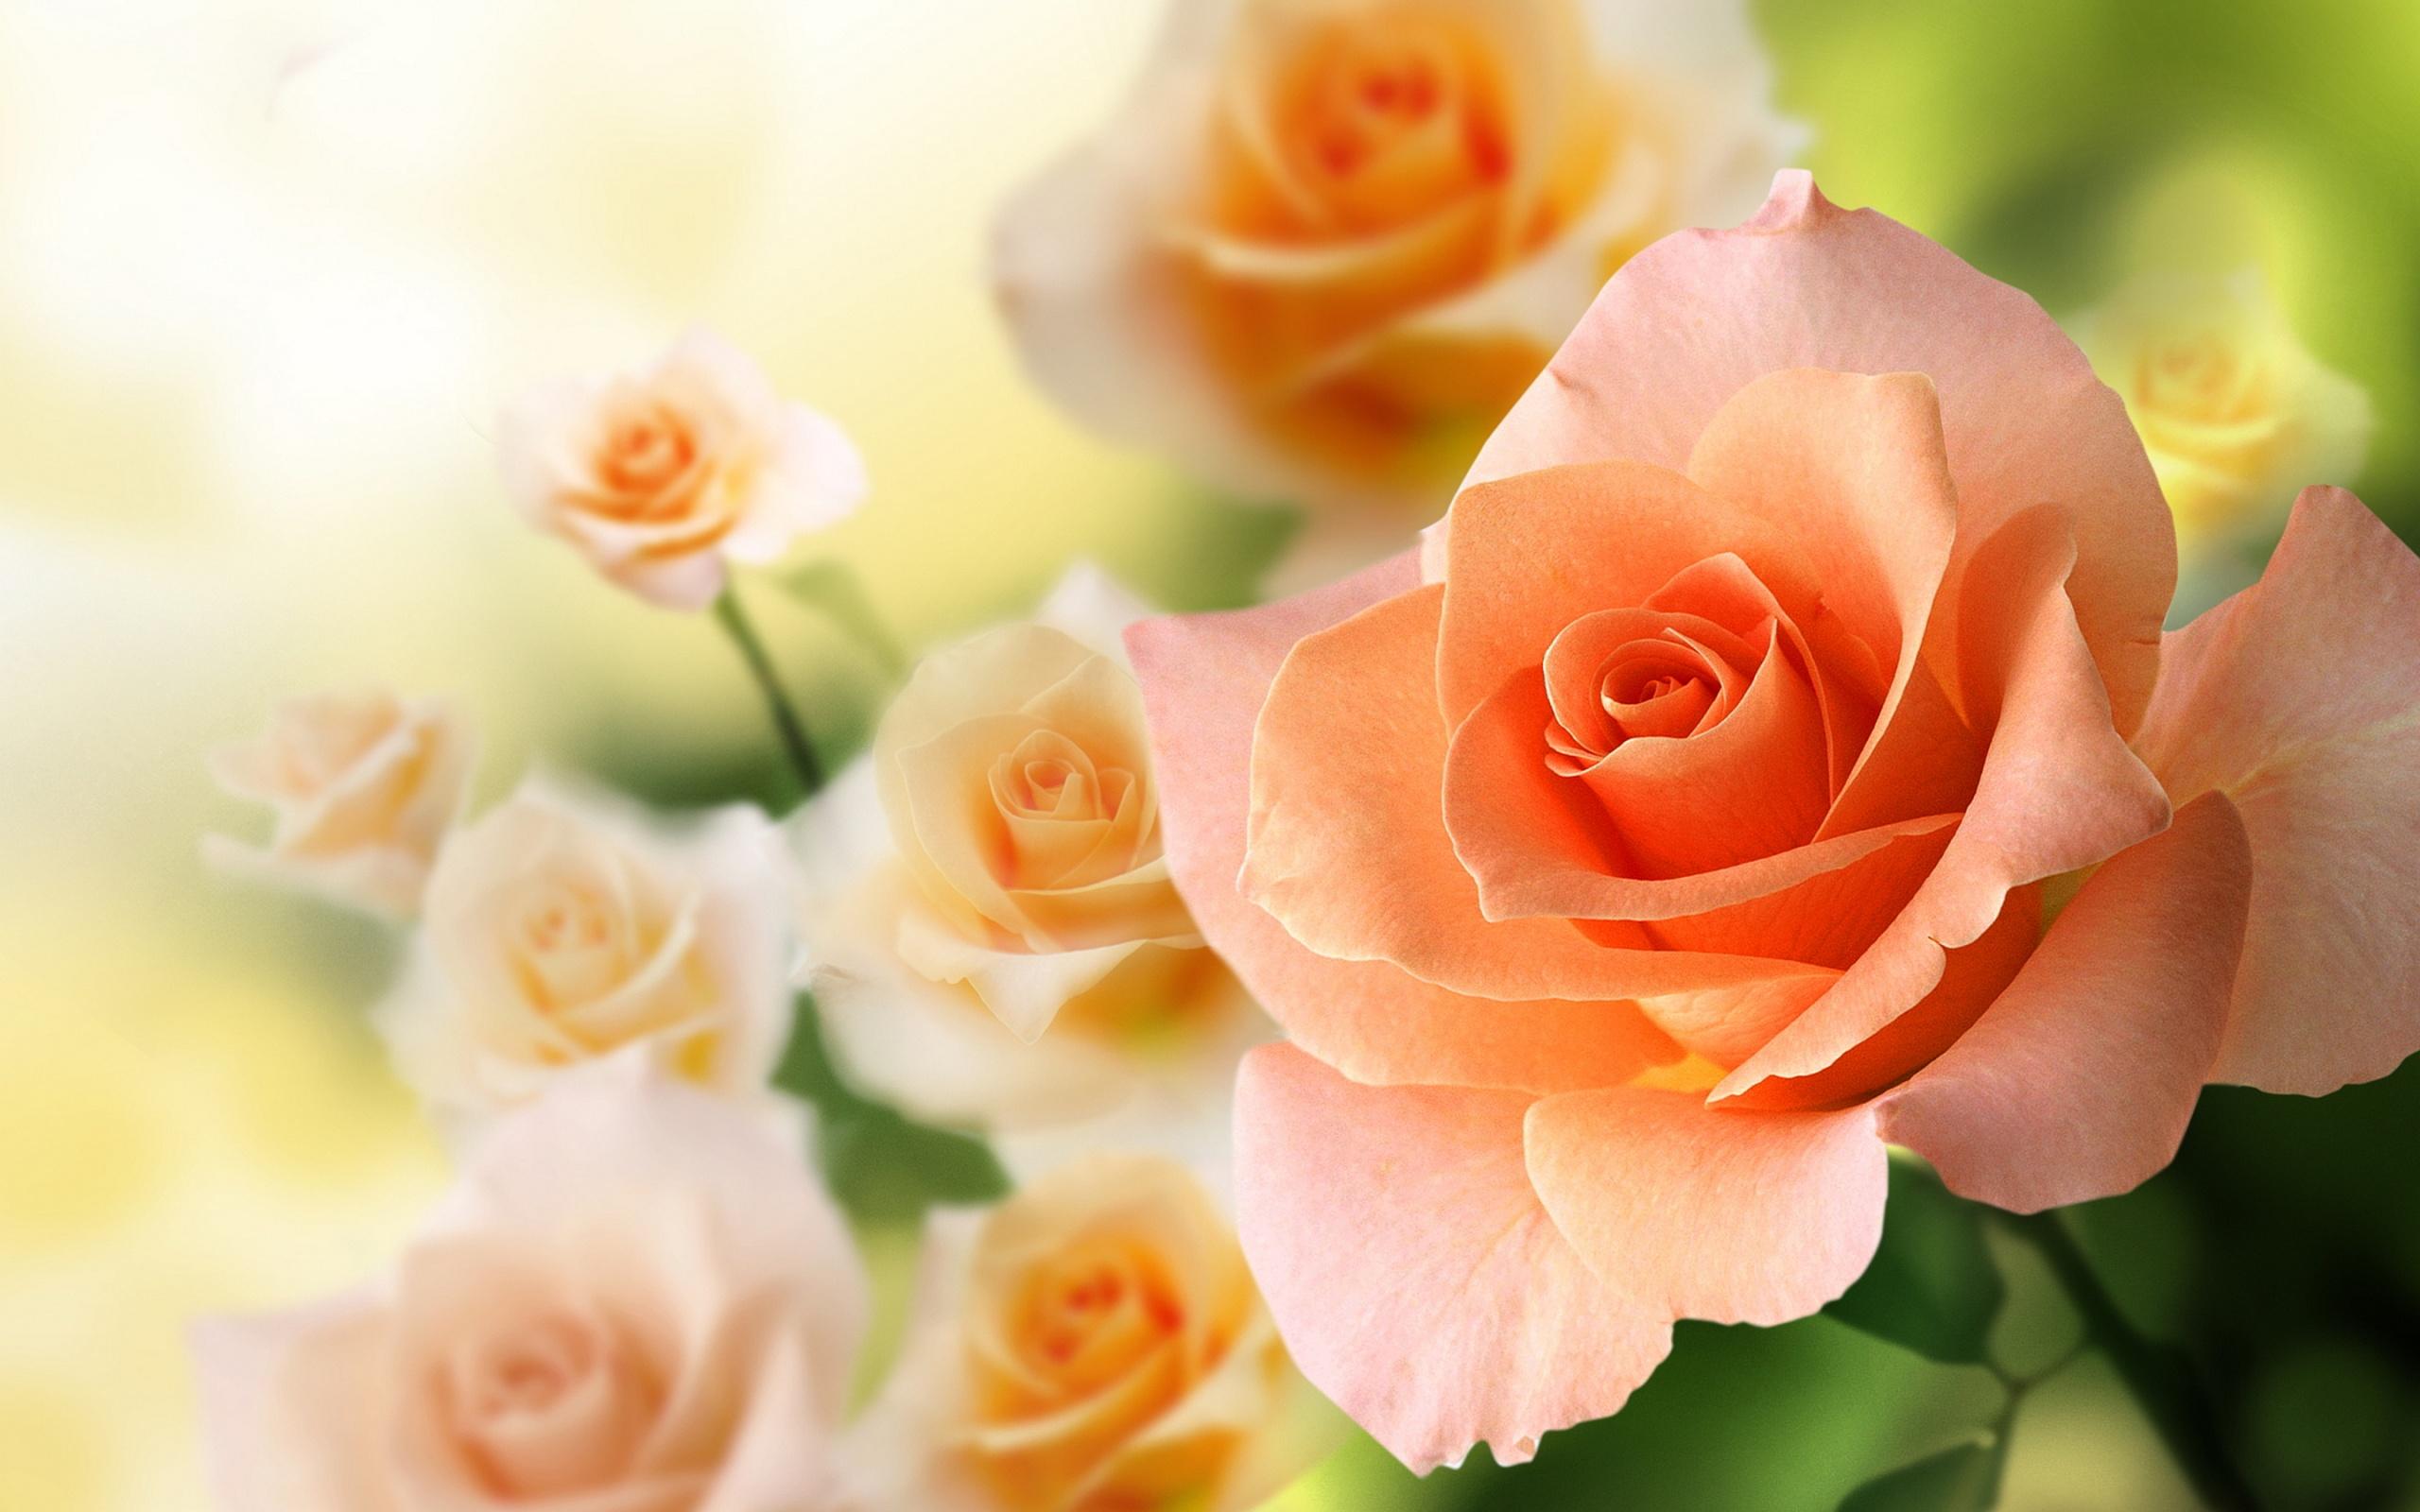 Peach flowers wallpaper 16791 2560x1600 px for Cream rose wallpaper